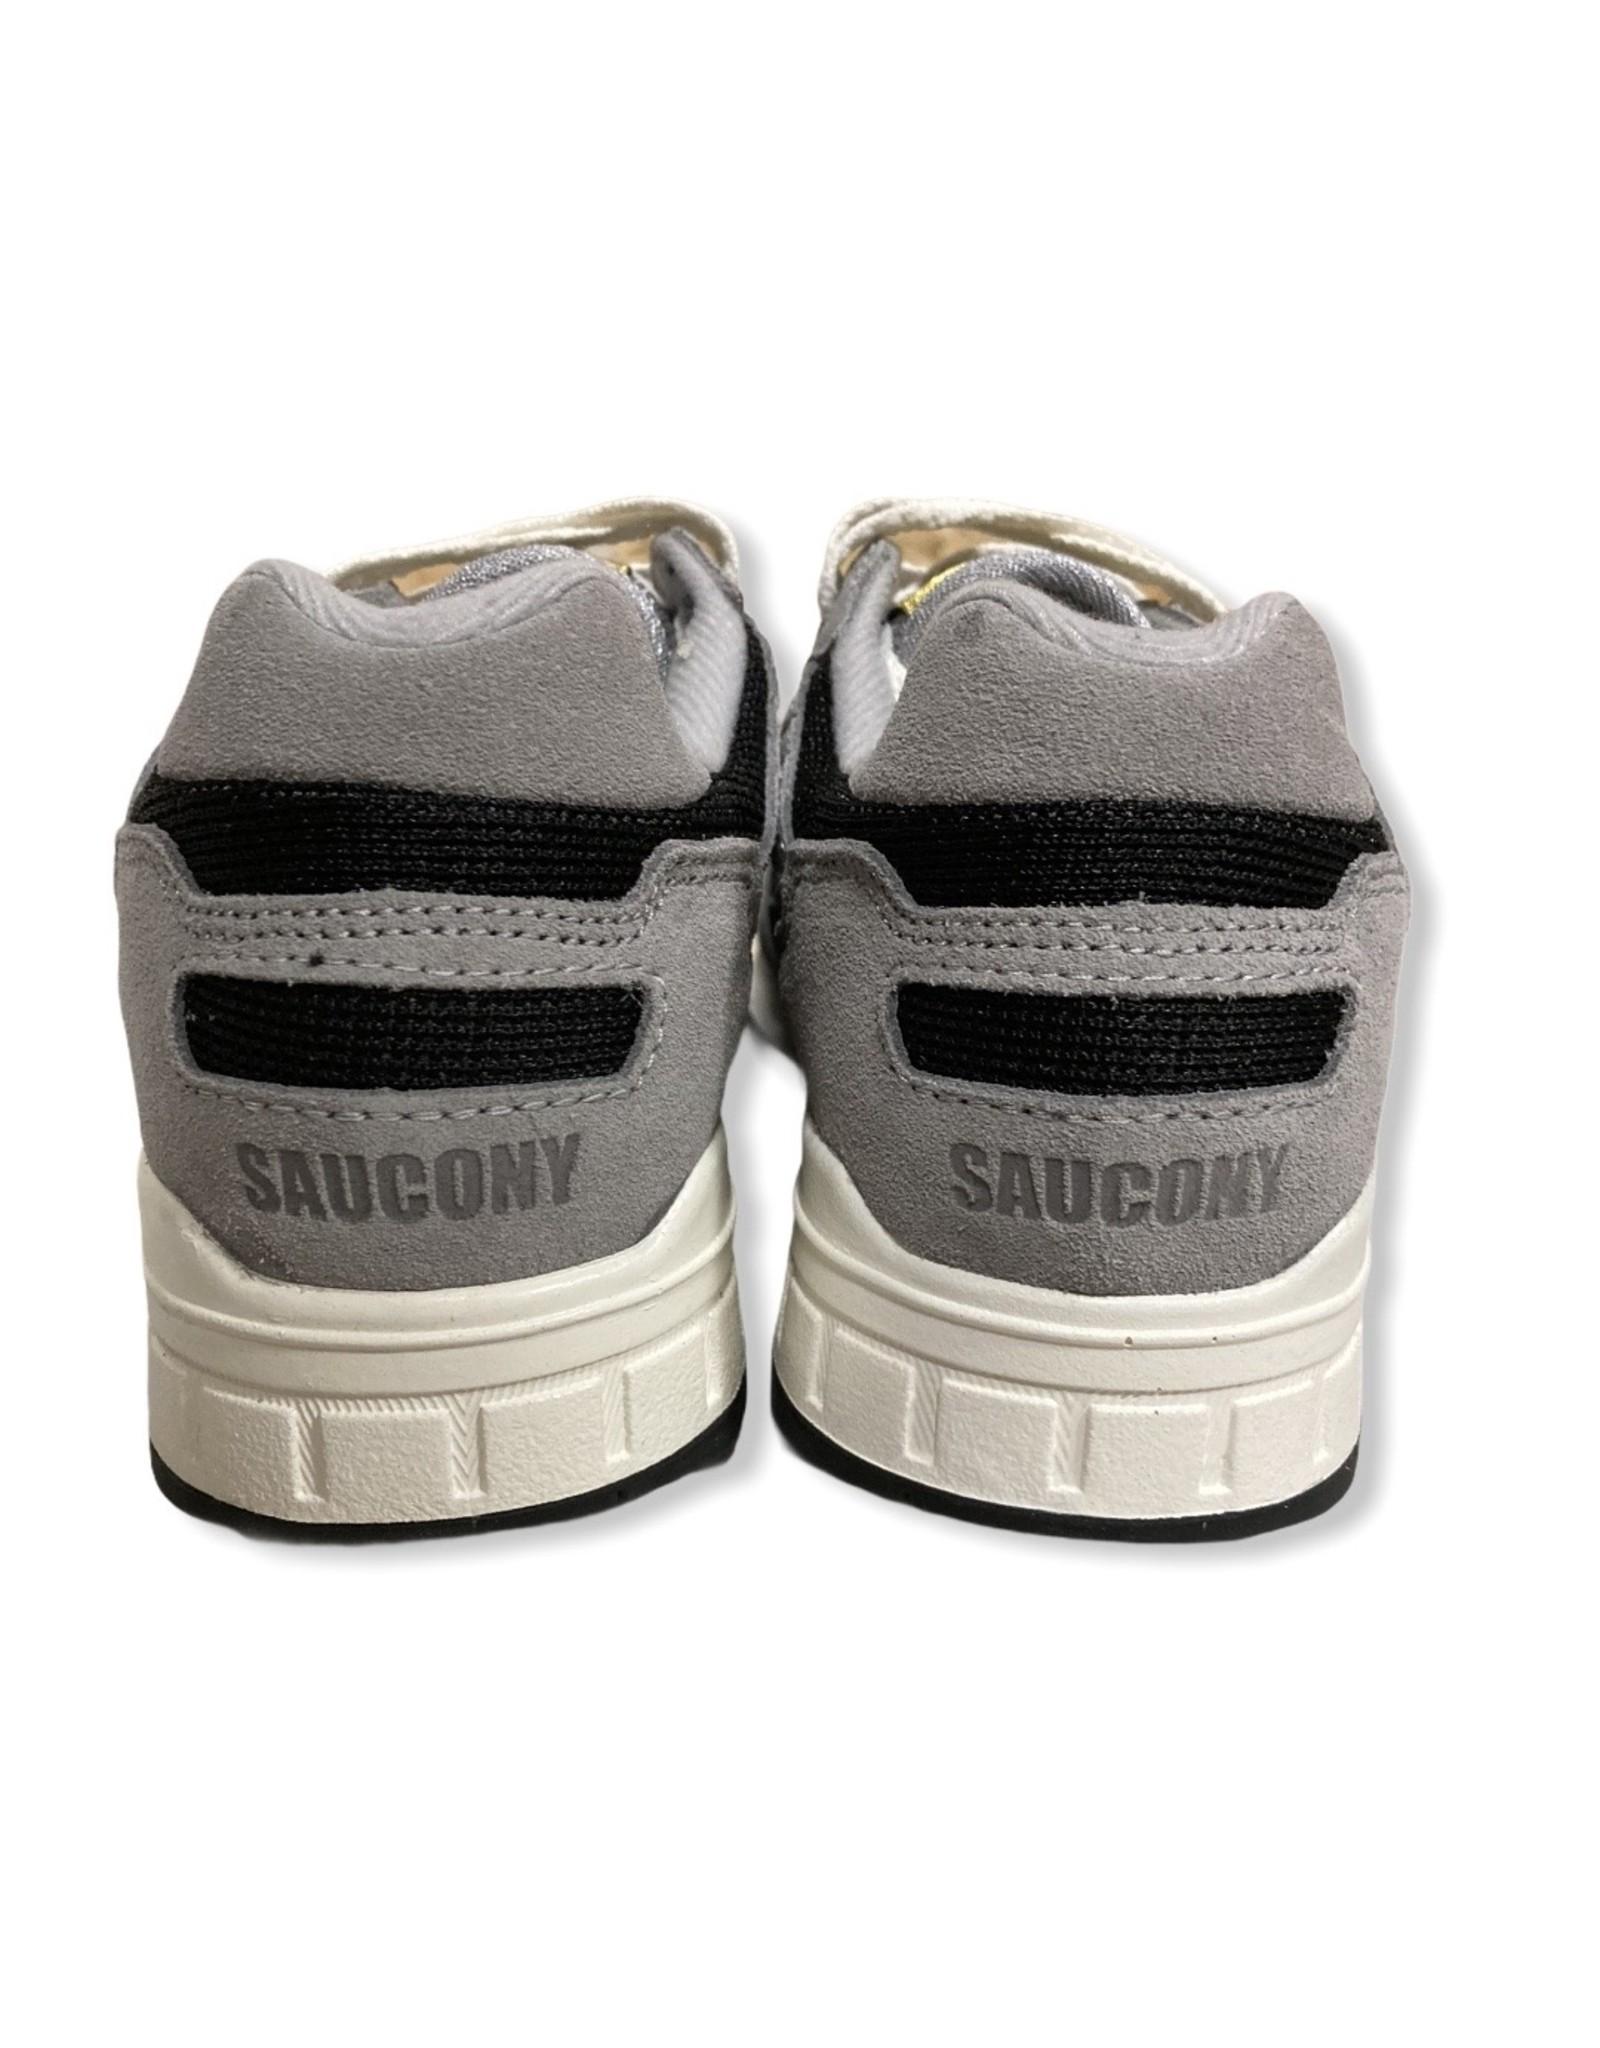 Saucony FW20 Shadow grey